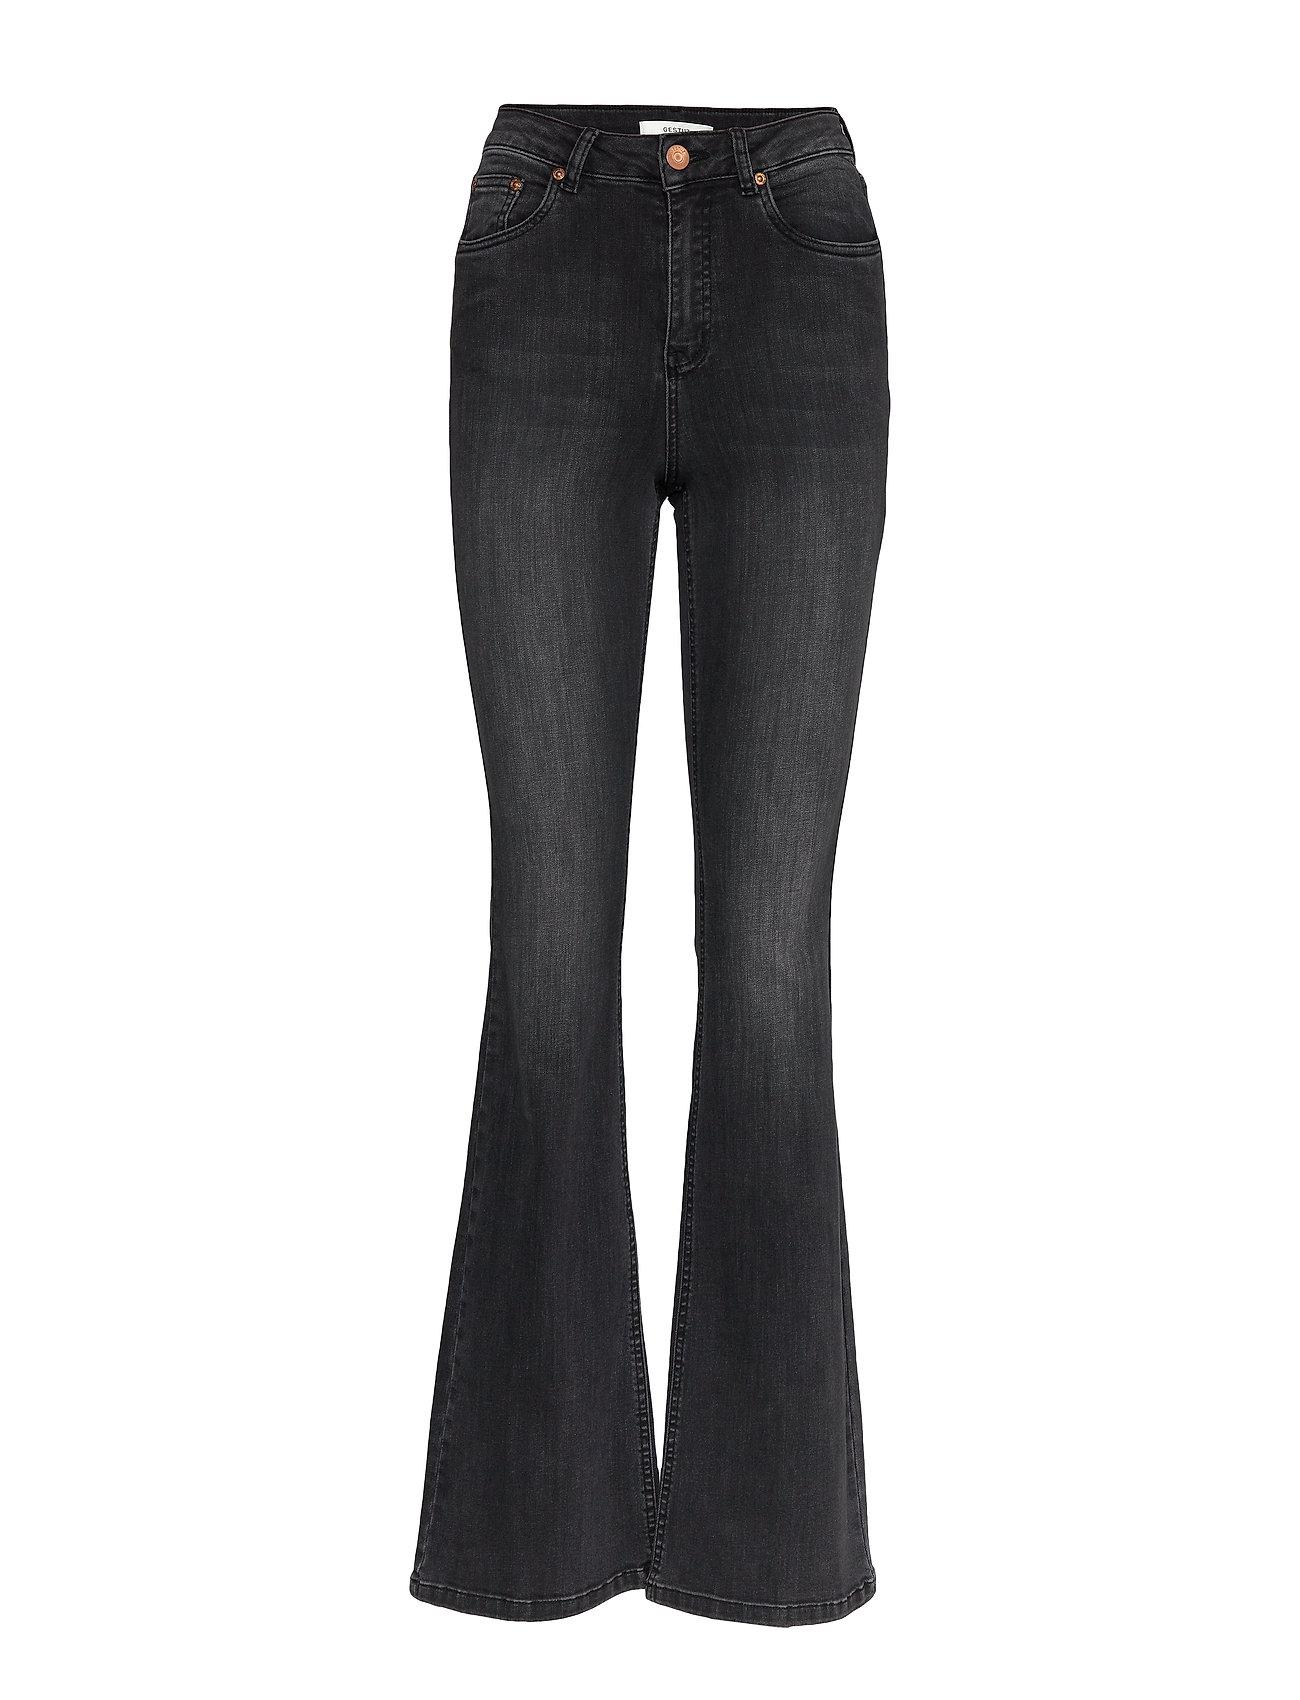 Gestuz EmilindaGZ long jeans - CHARCOAL GREY